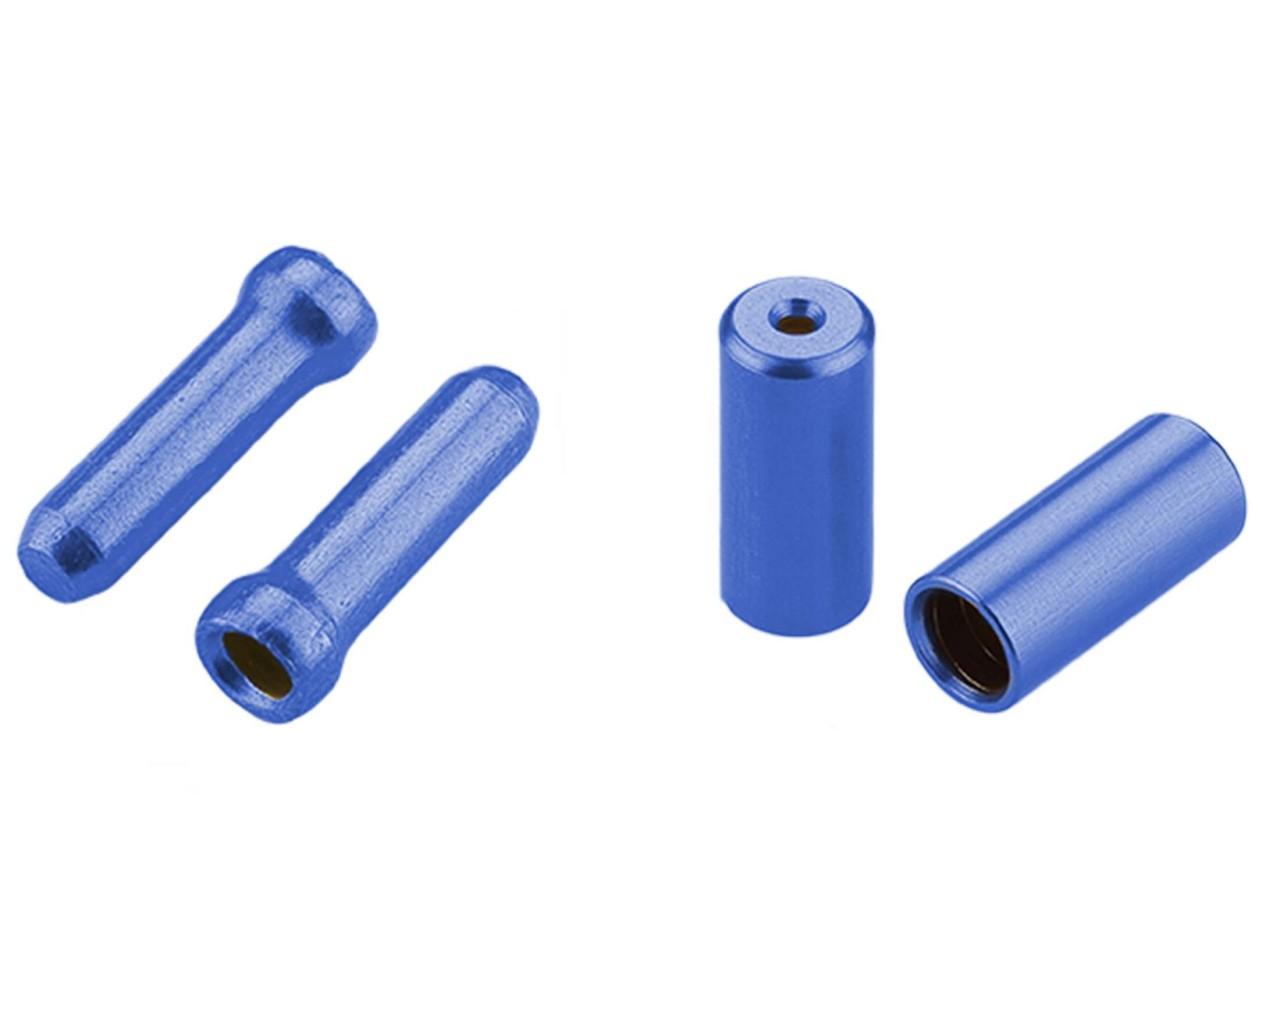 Cube RFR Endkappen Pro Set Universal   Blau